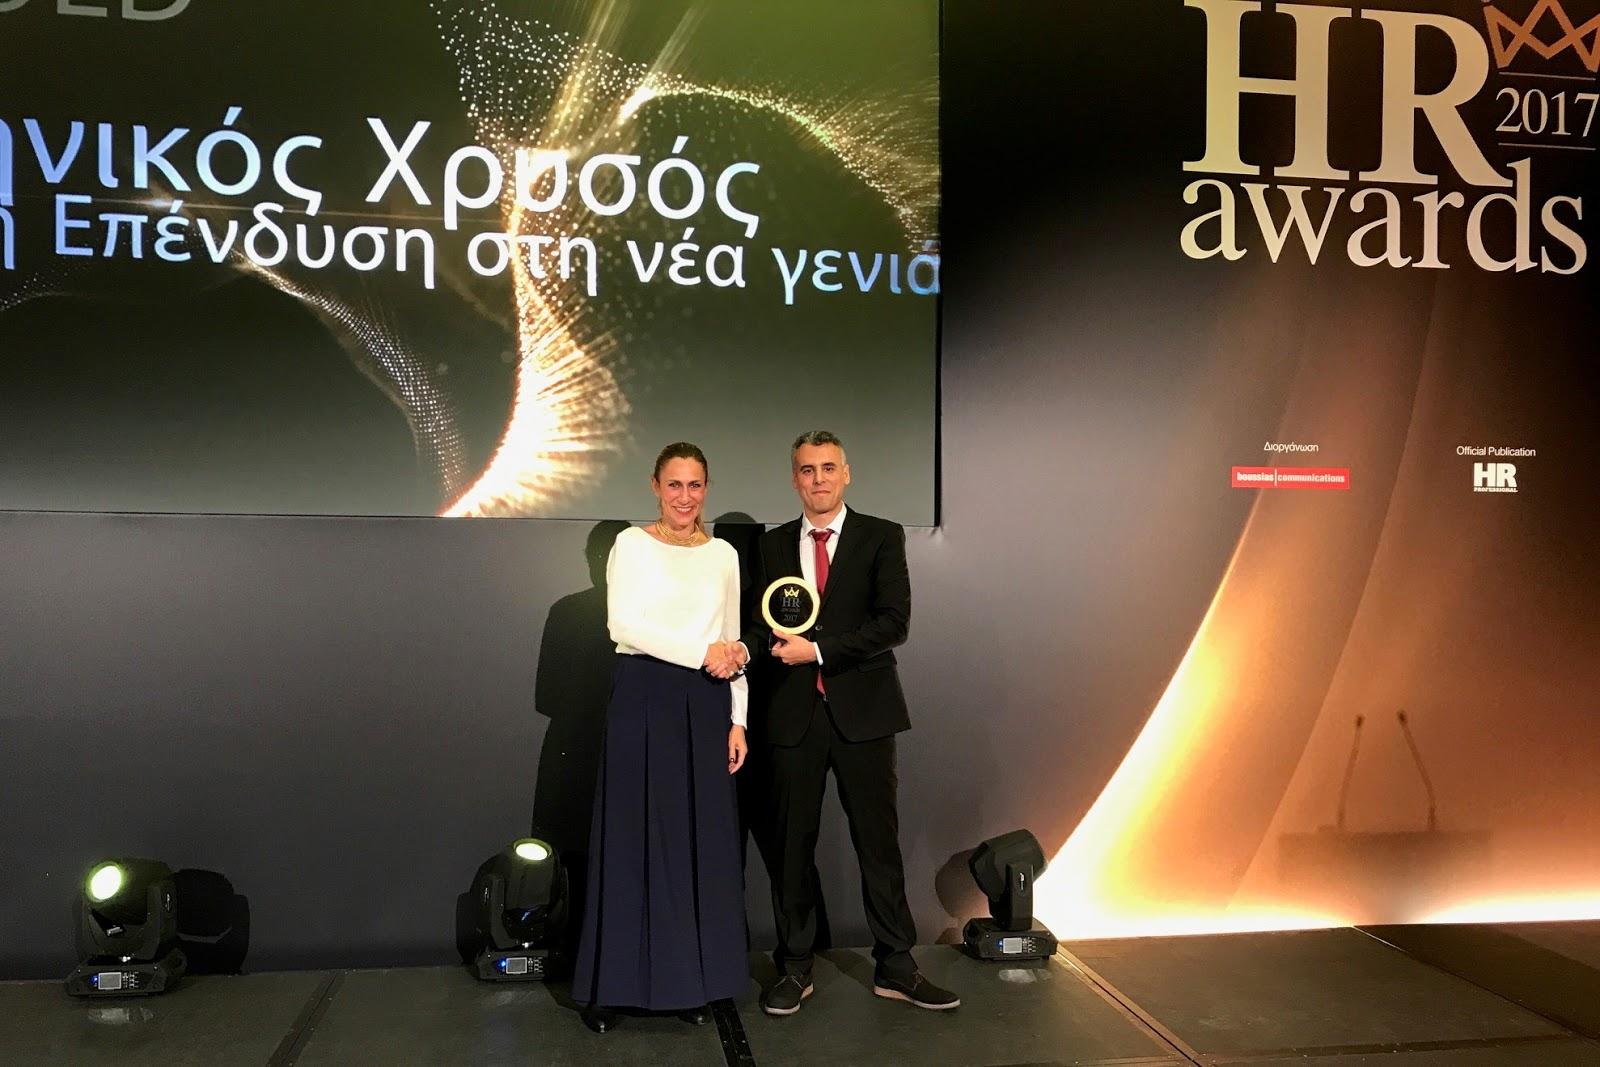 HR Awards 207: Gold βραβείο στην Ελληνικός Χρυσός για την στήριξή της στη νέα γενιά